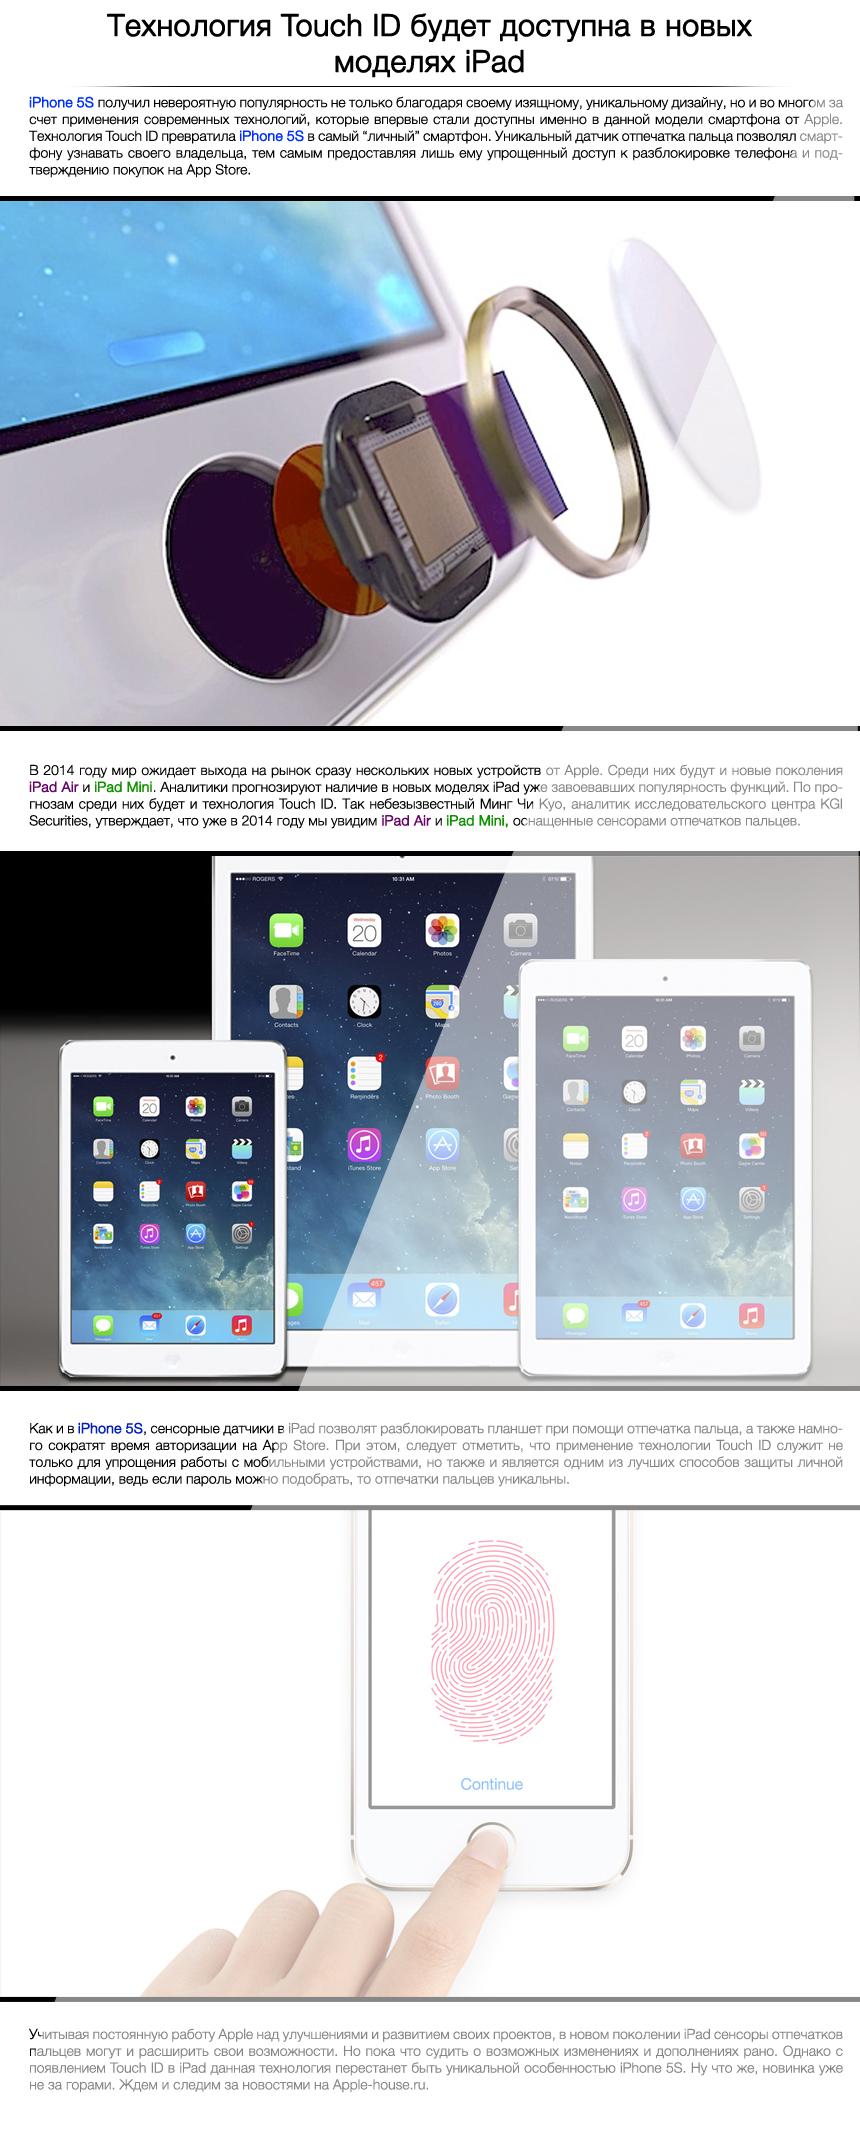 News: Технология Touch ID будет доступна в новых моделях iPad